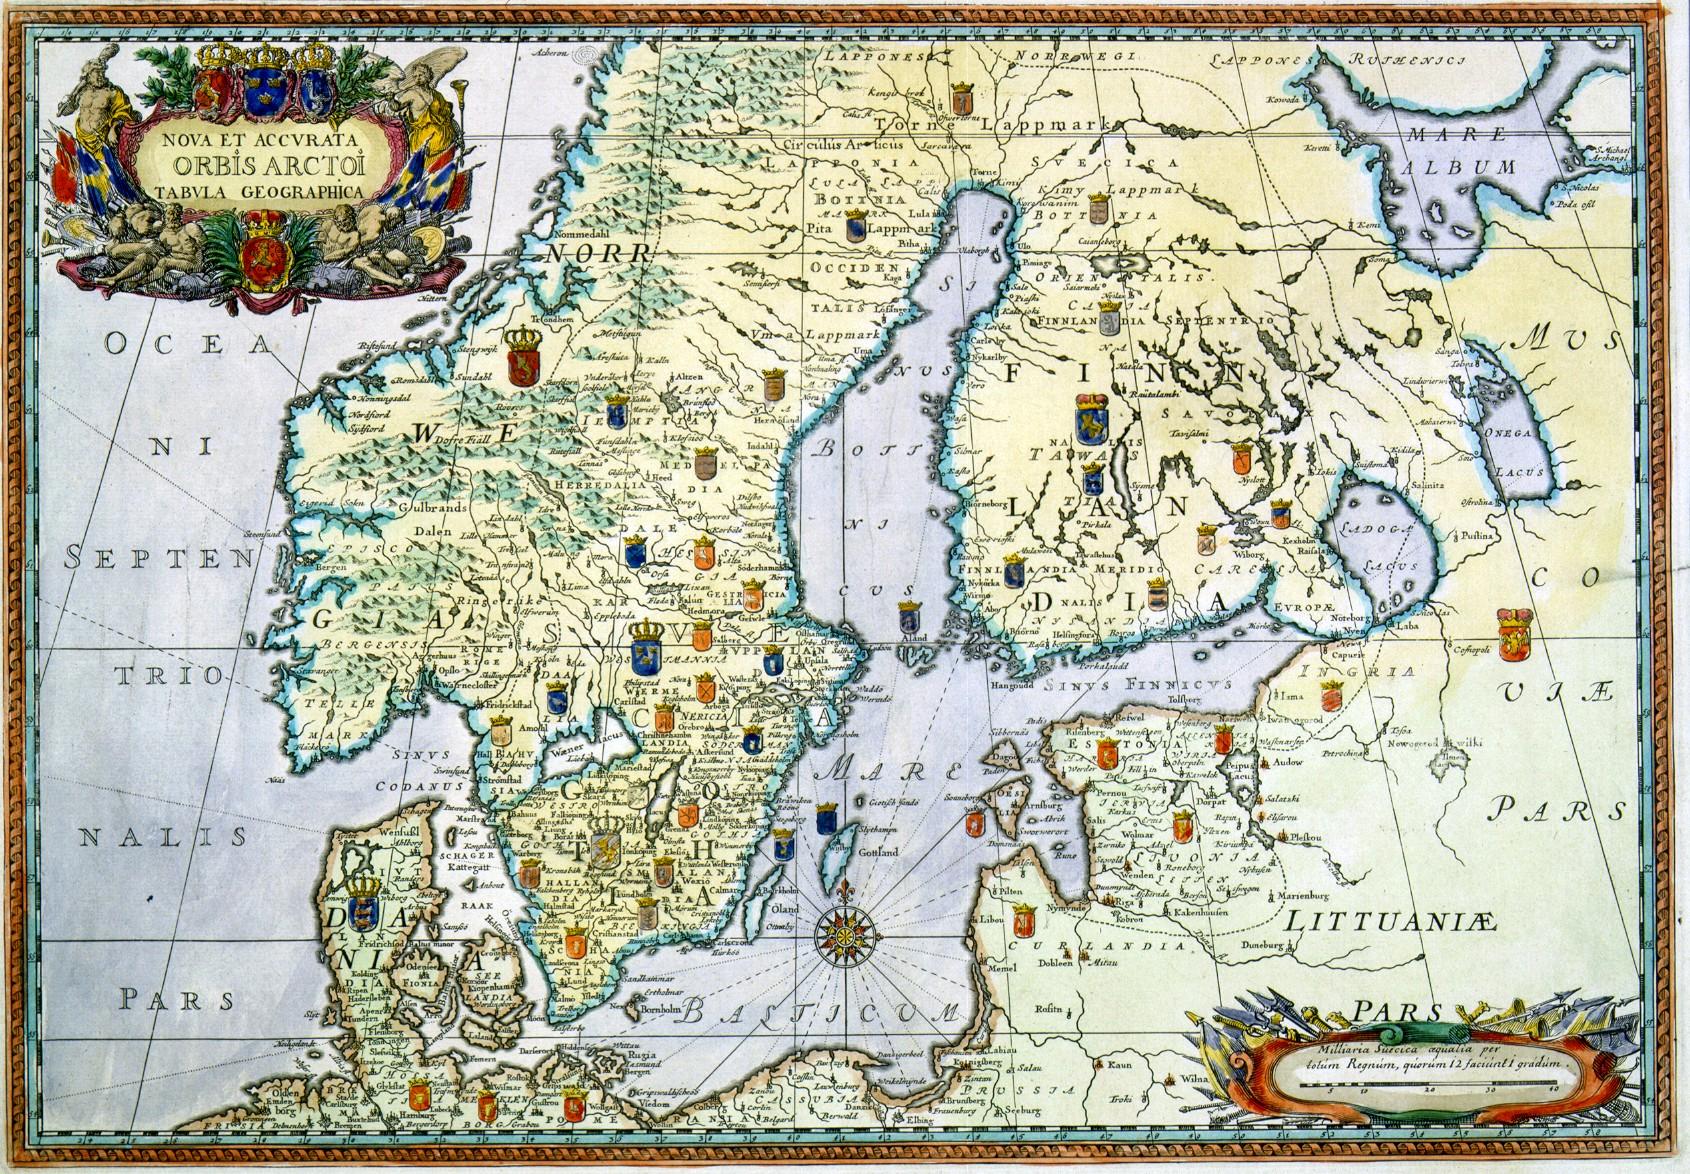 Ruotsin Valtakunta Kartta Jyx Expo